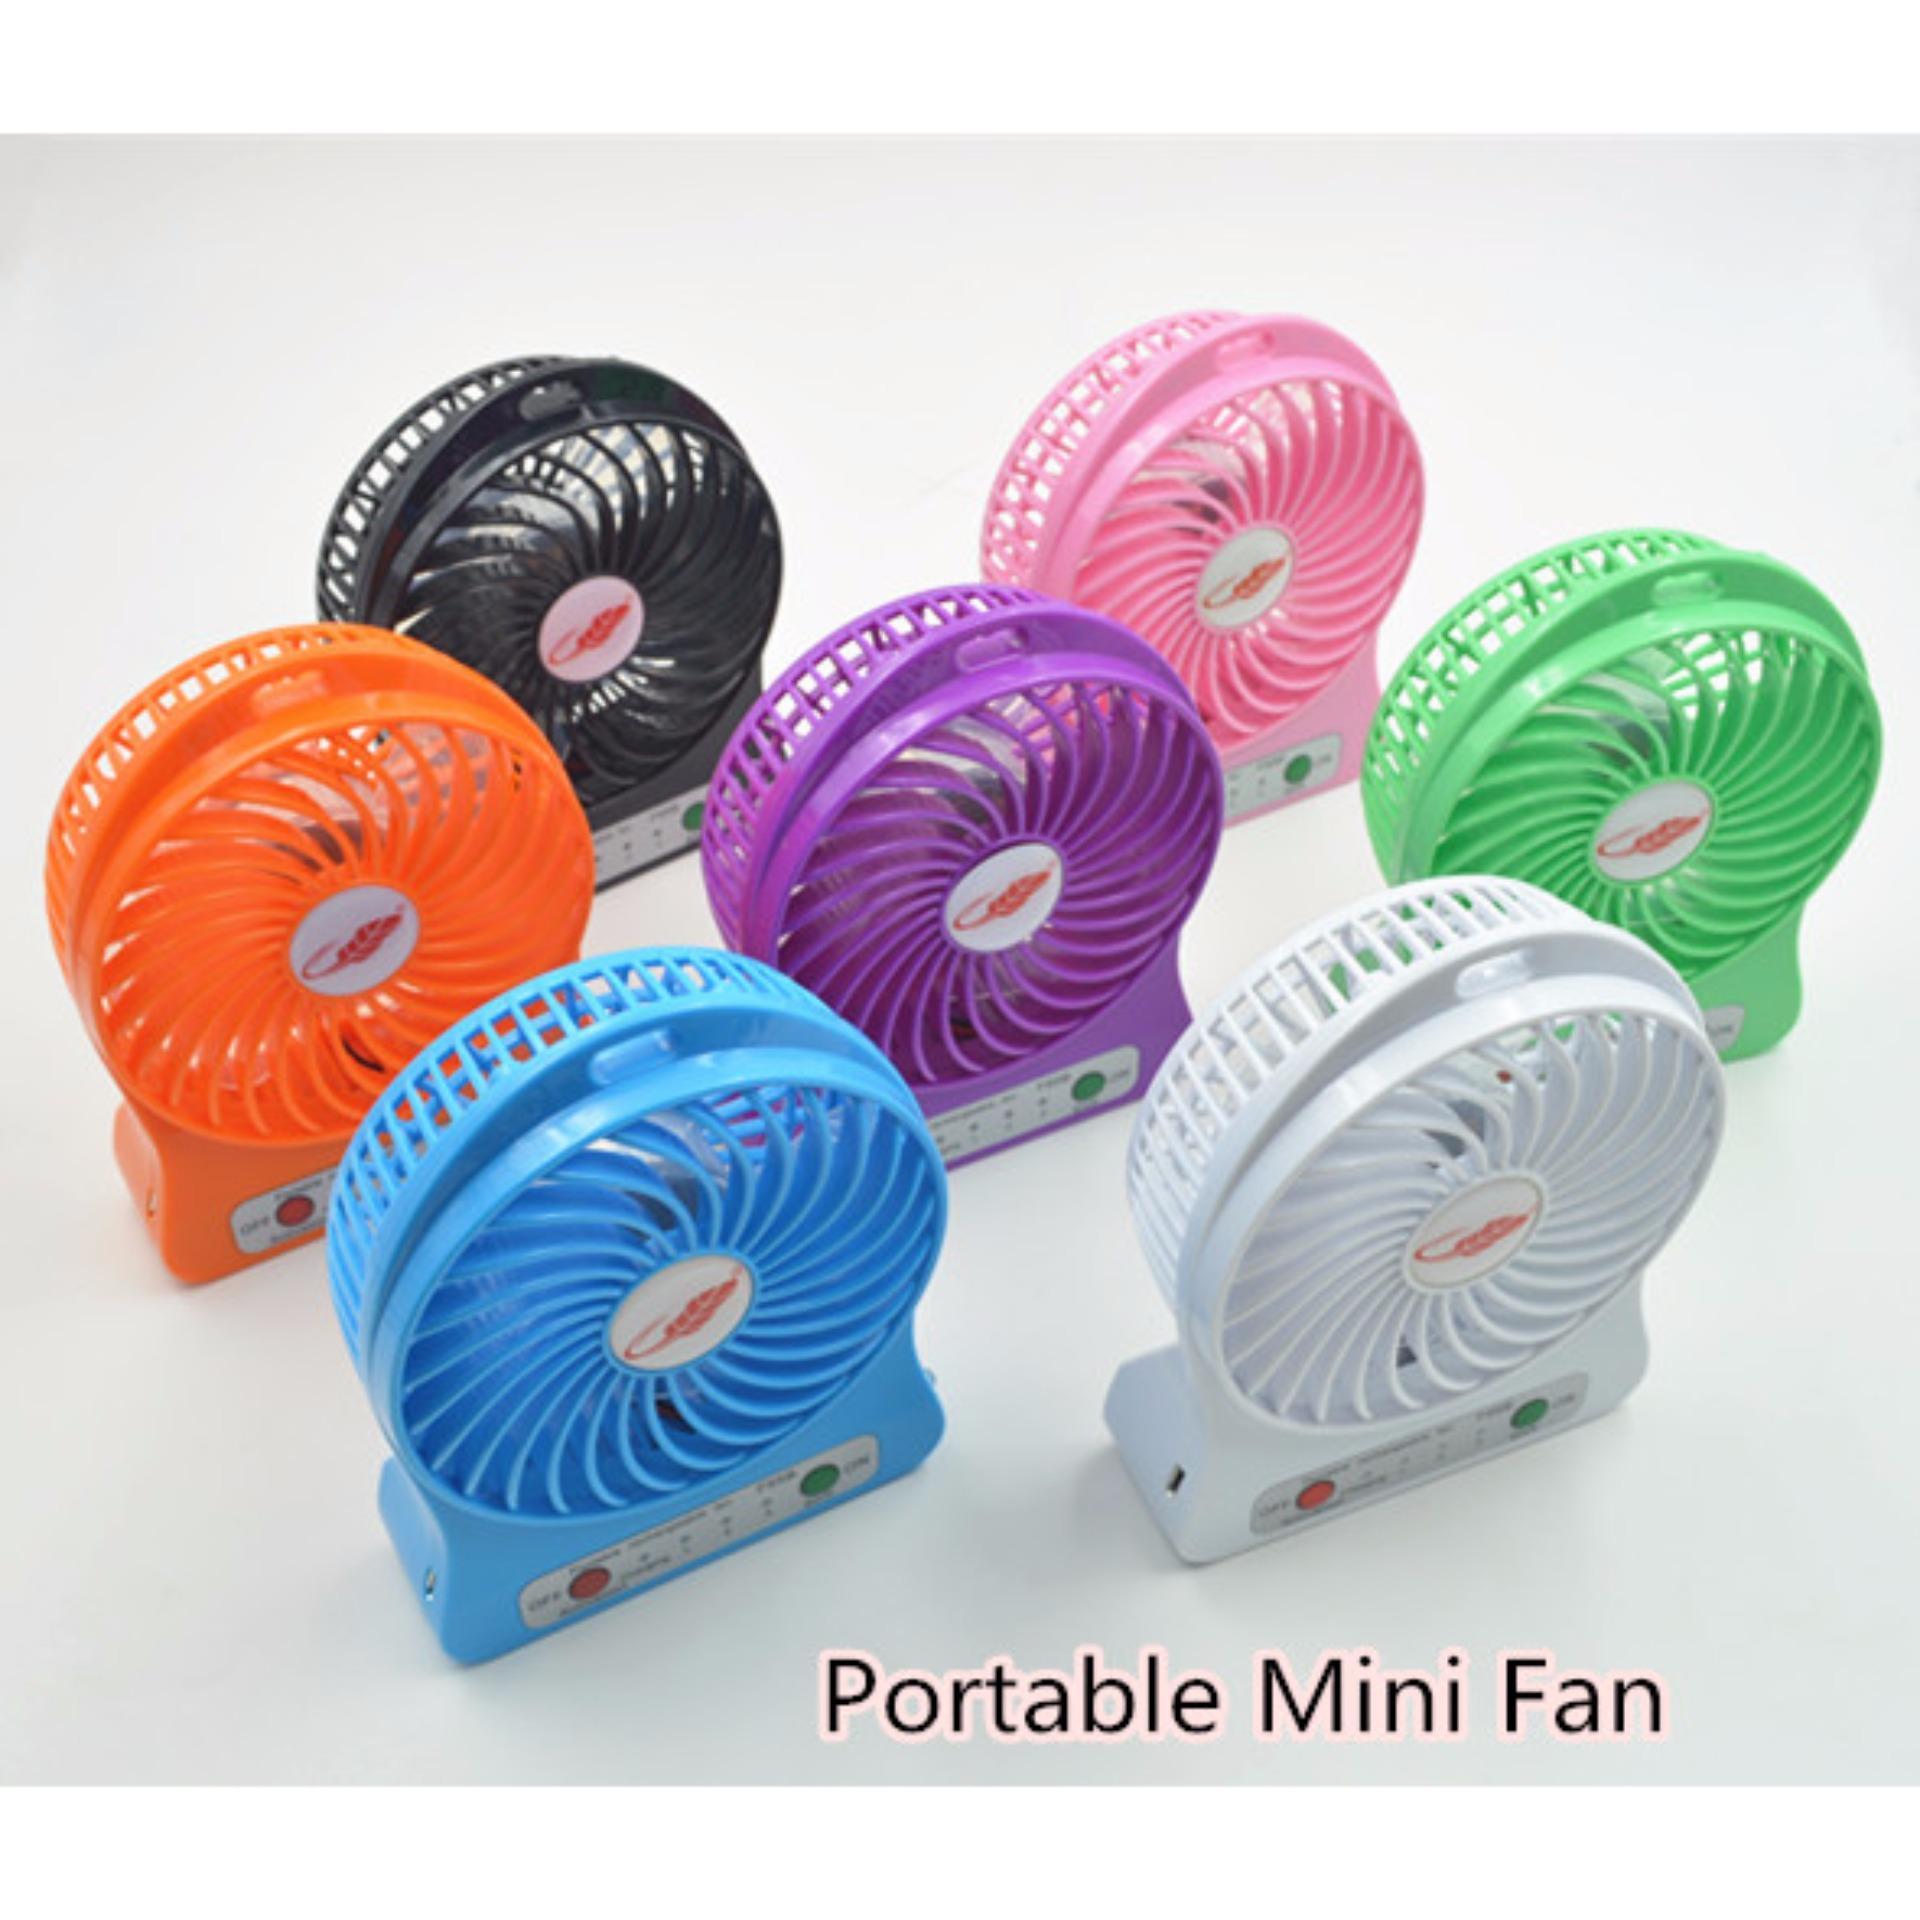 Perbandingan Harga Power Bank Kipas Angin Mini Portable Fan Powerbank Usbportable